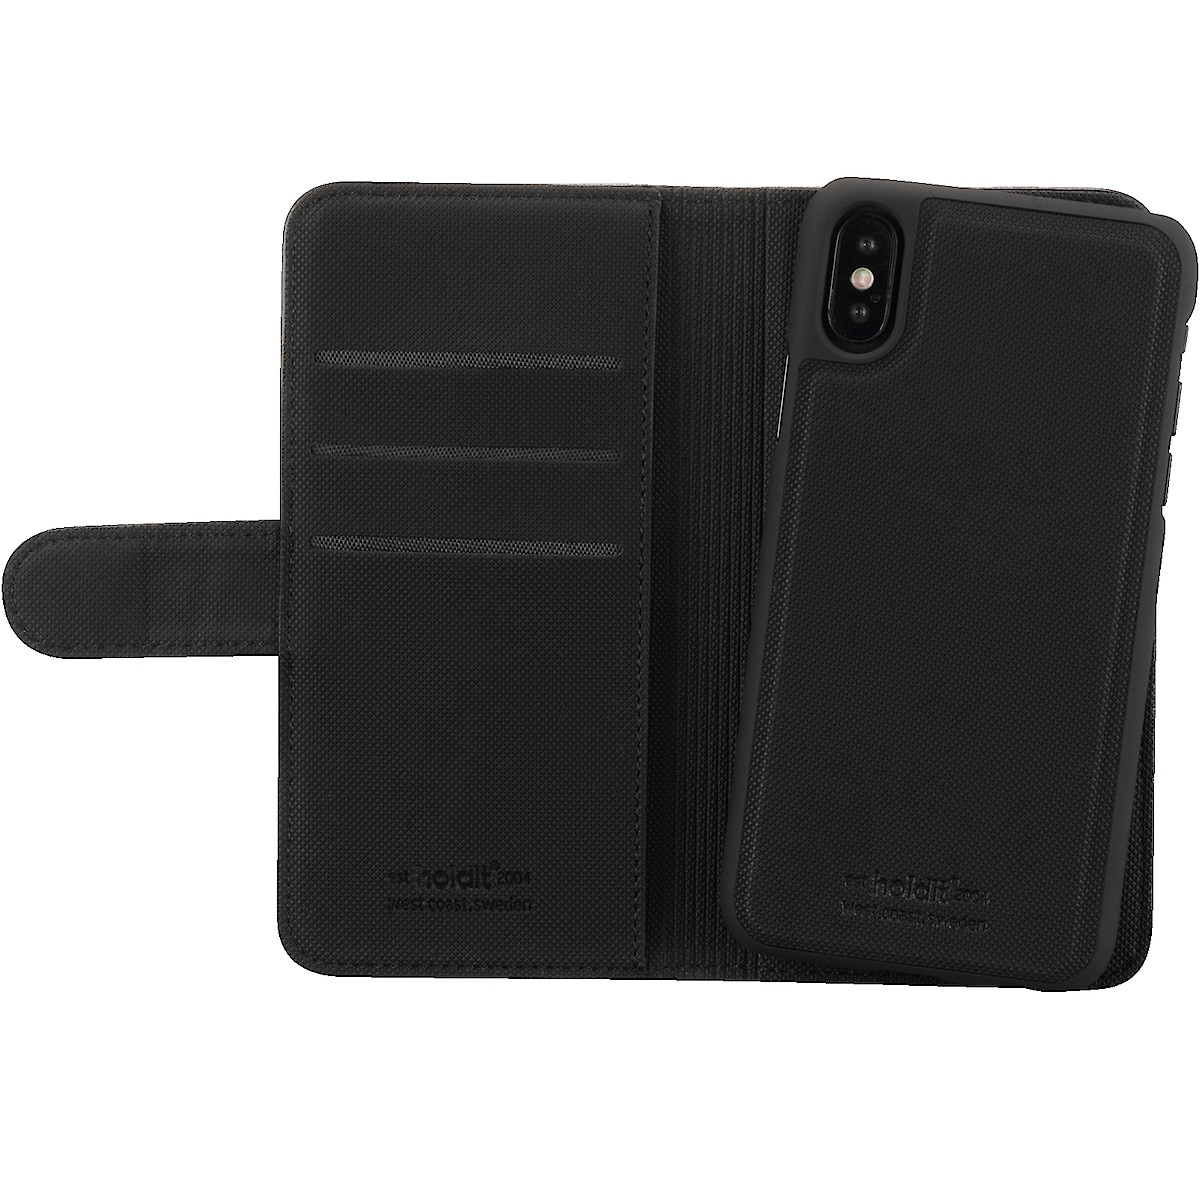 Lompakkokotelo iPhone X/XS, Holdit